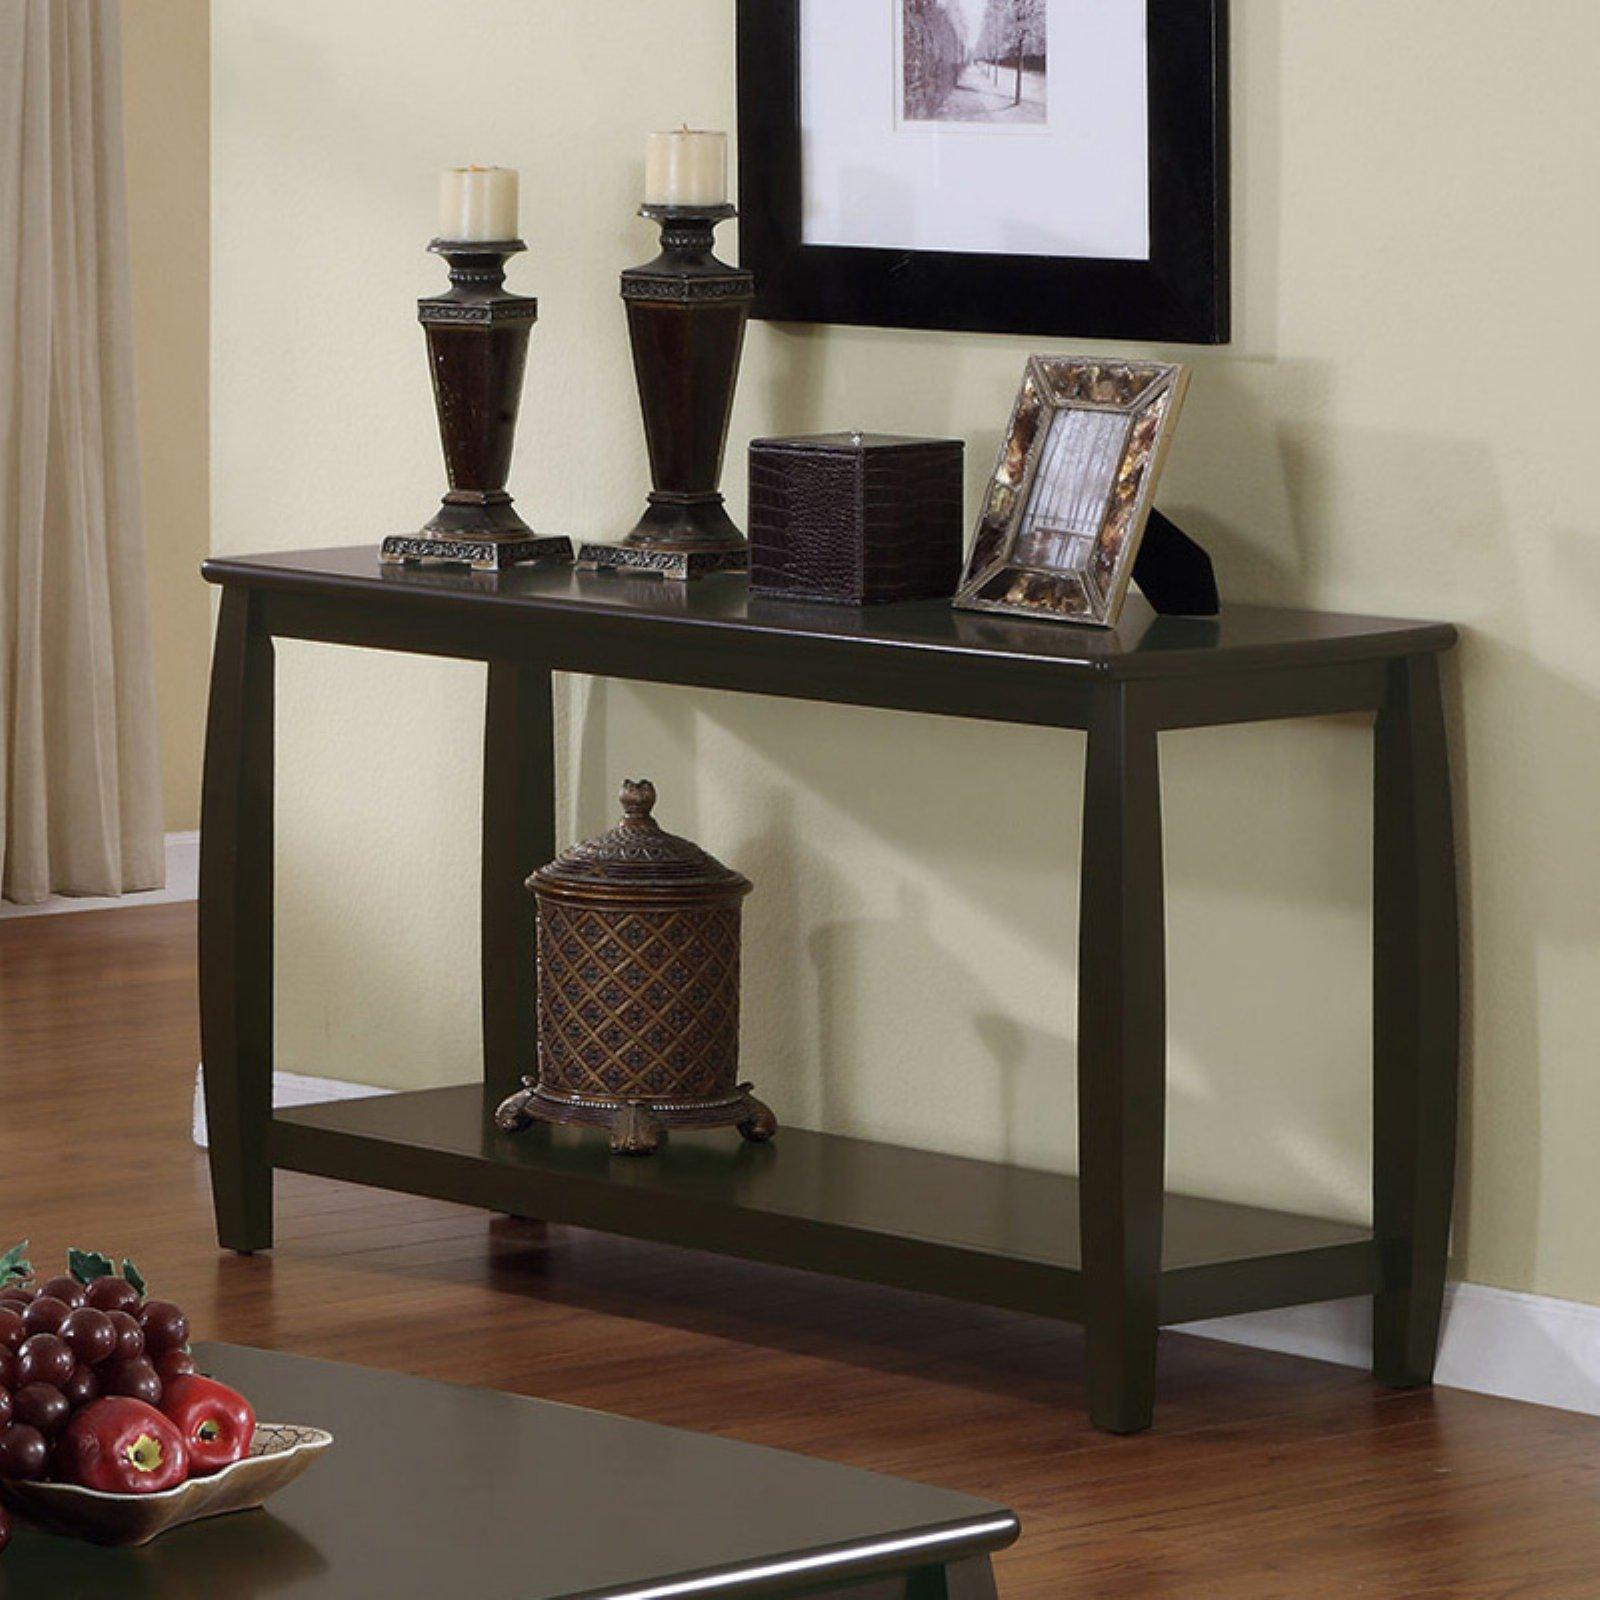 Coaster Furniture Wood Sofa Table - Cappuccino